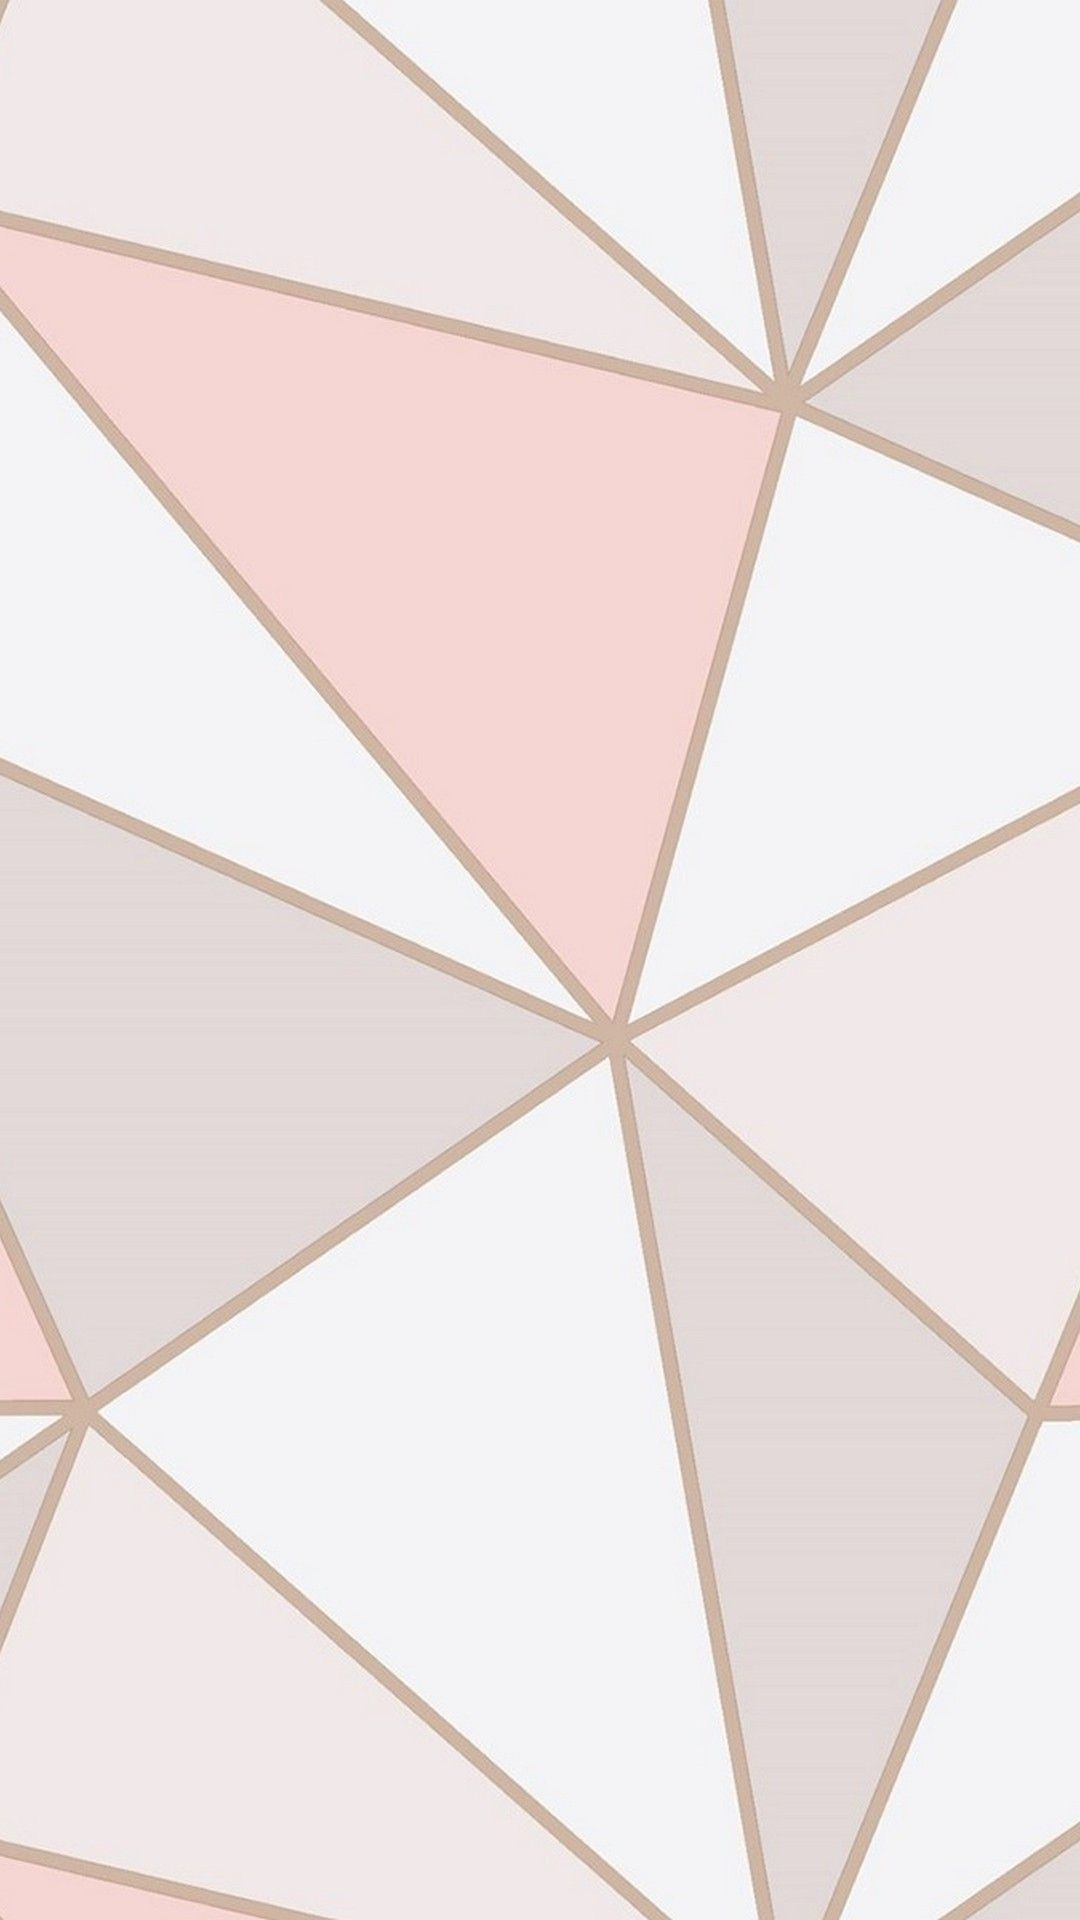 Rose Gold iPhone hd wallpaper